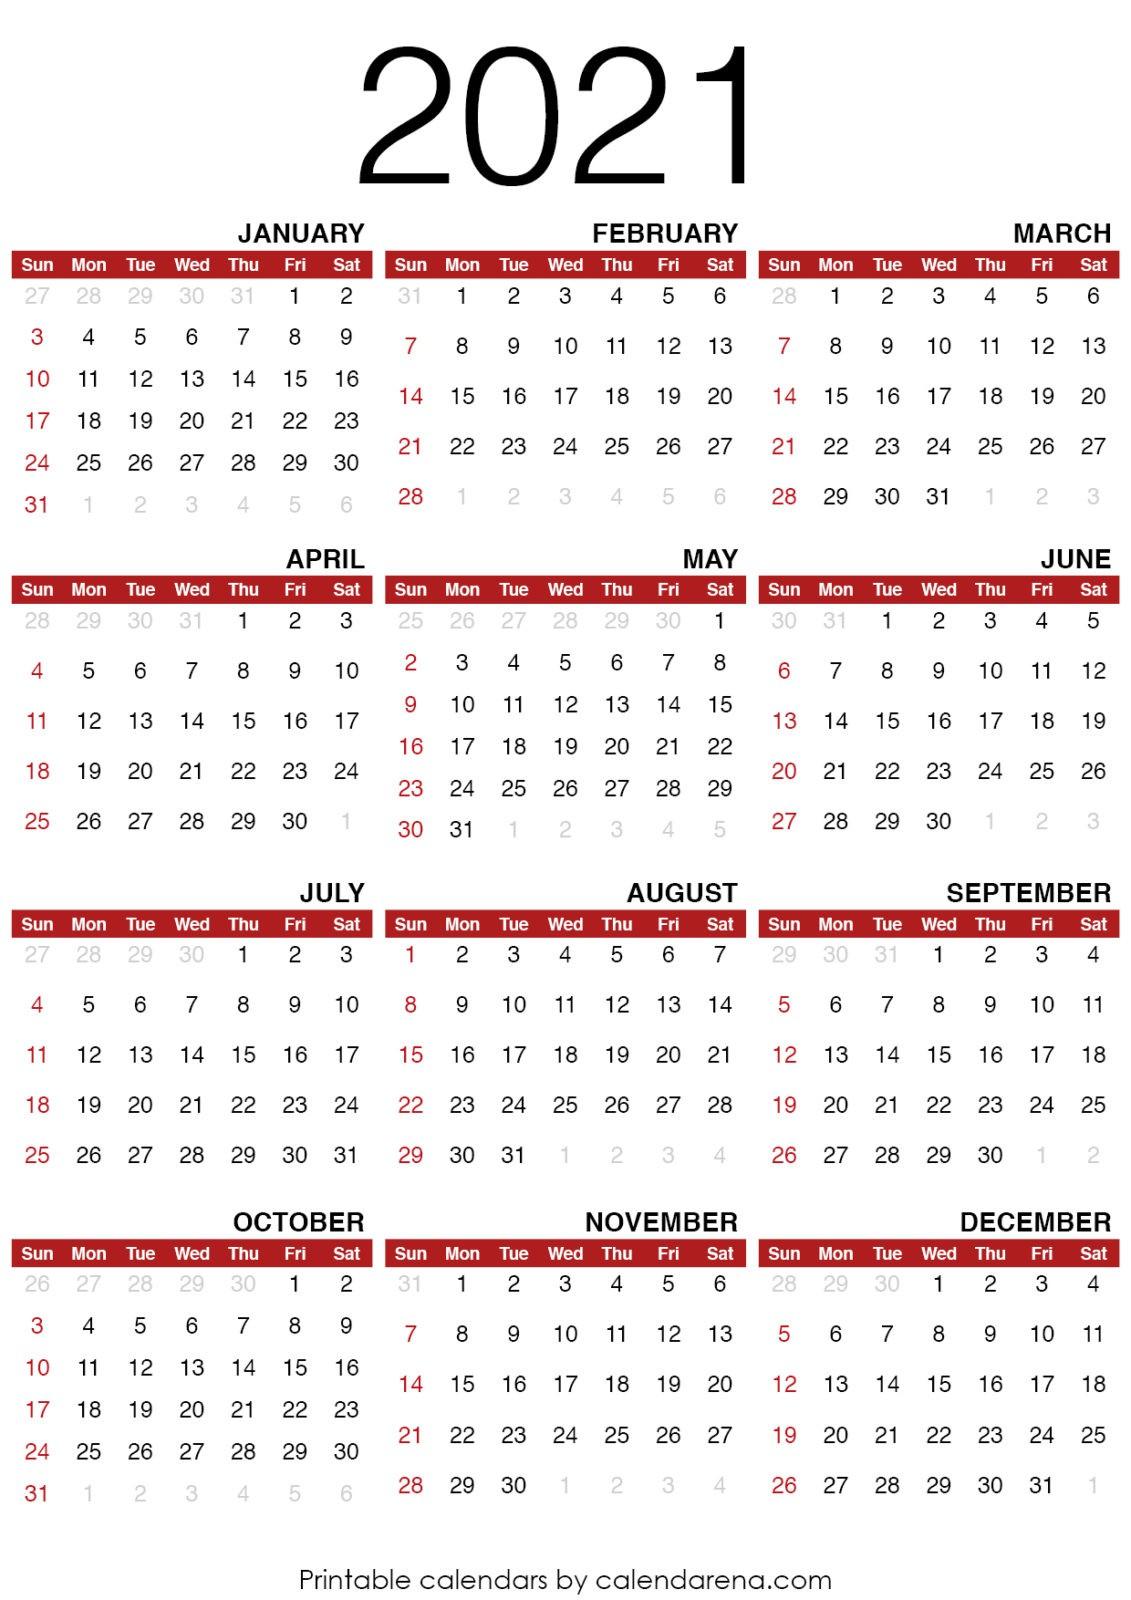 Small Printable Calendar 2021 Free | 2021 Printable Calendars